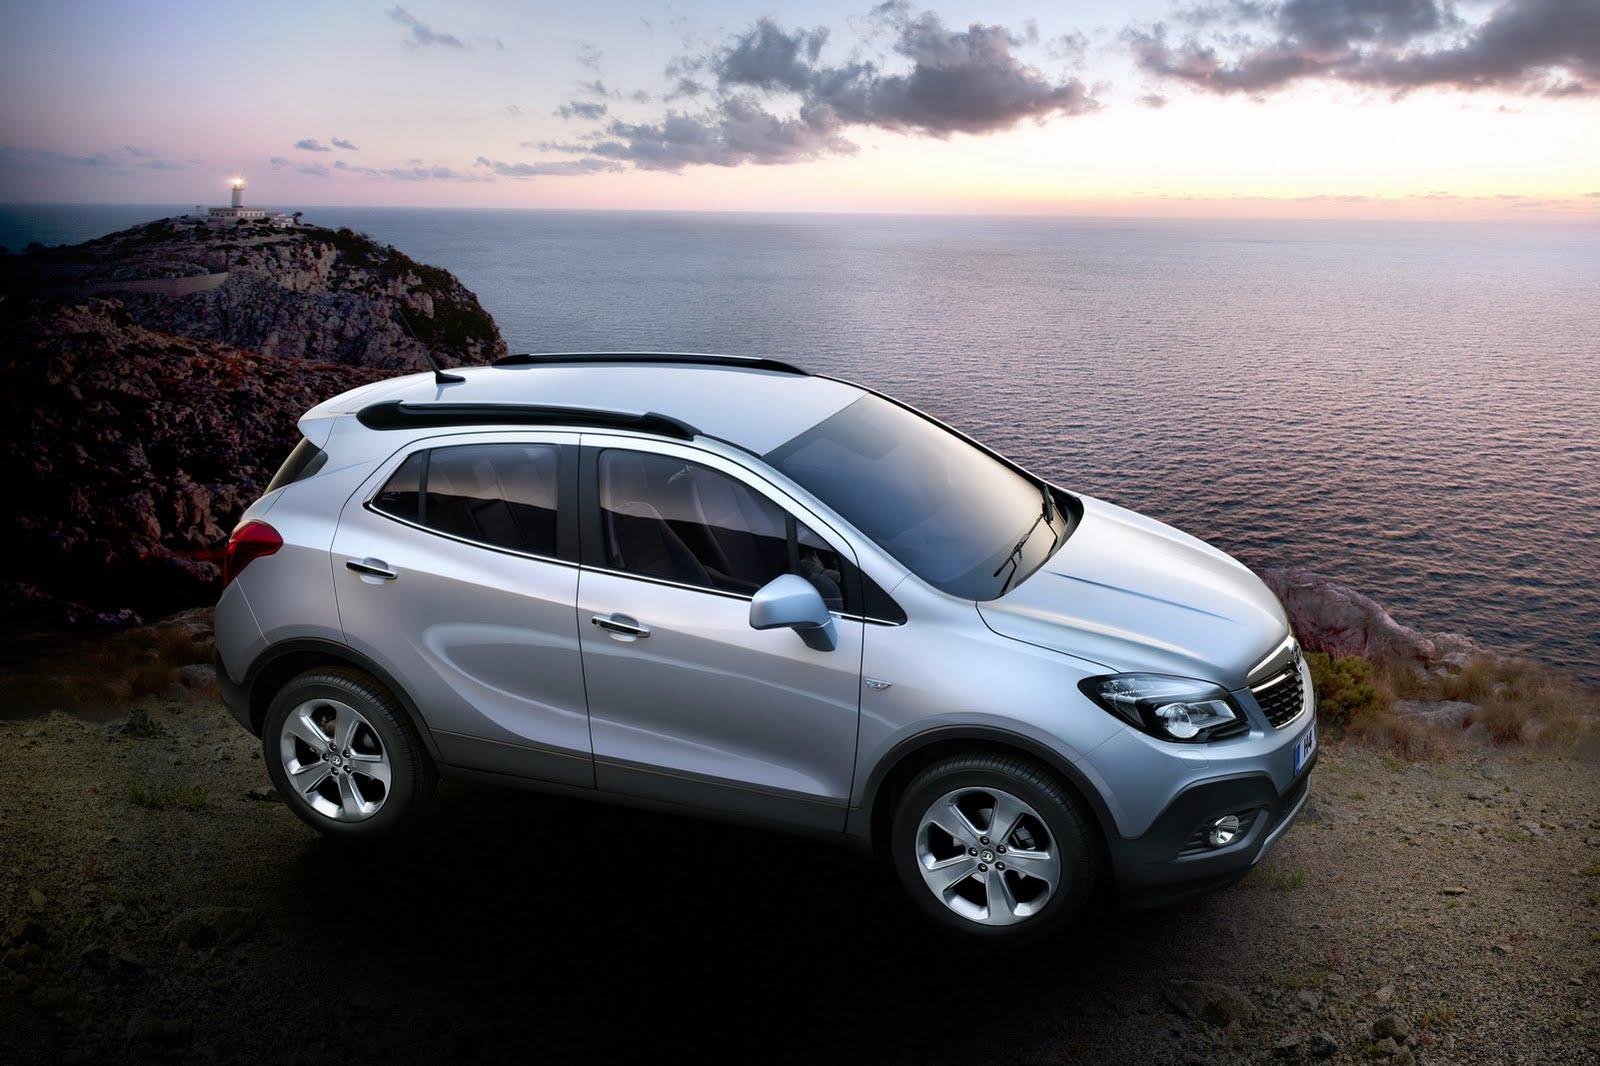 Dal web: le opinioni sull'Opel Mokka Recensioni